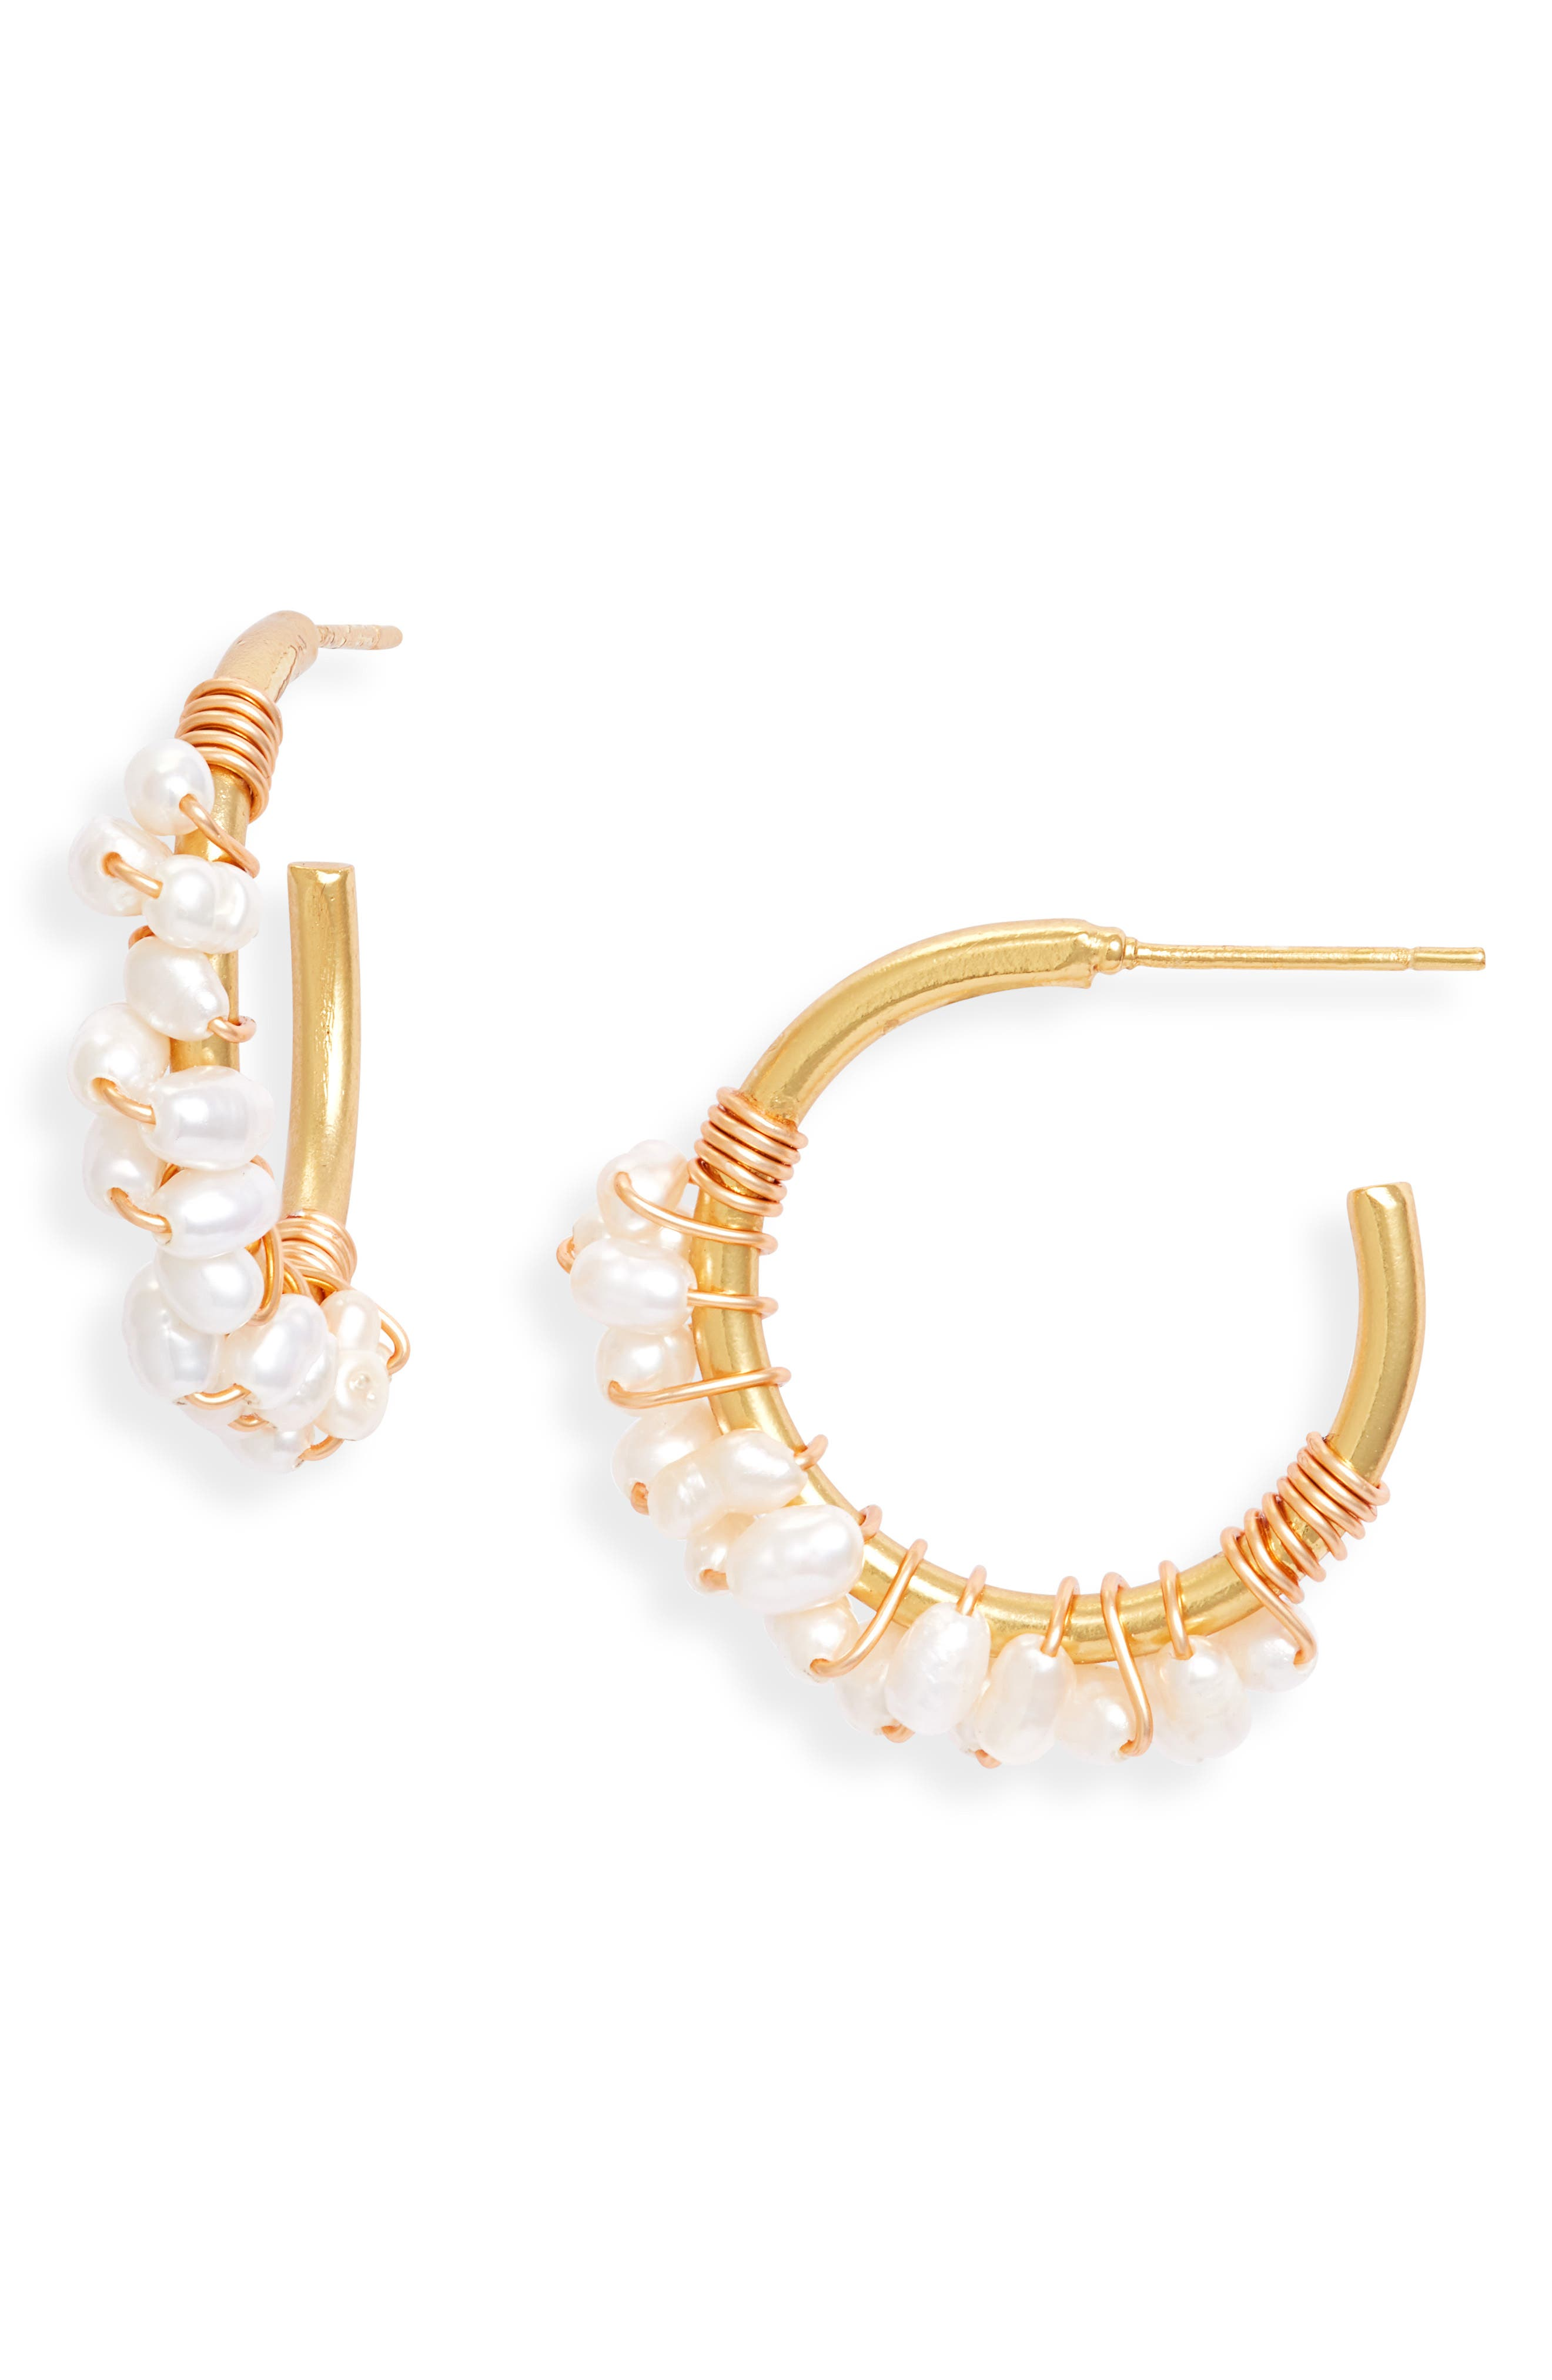 Crisobela Jewelry Baha Freshwater Pearl Hoop Earrings in Gold at Nordstrom